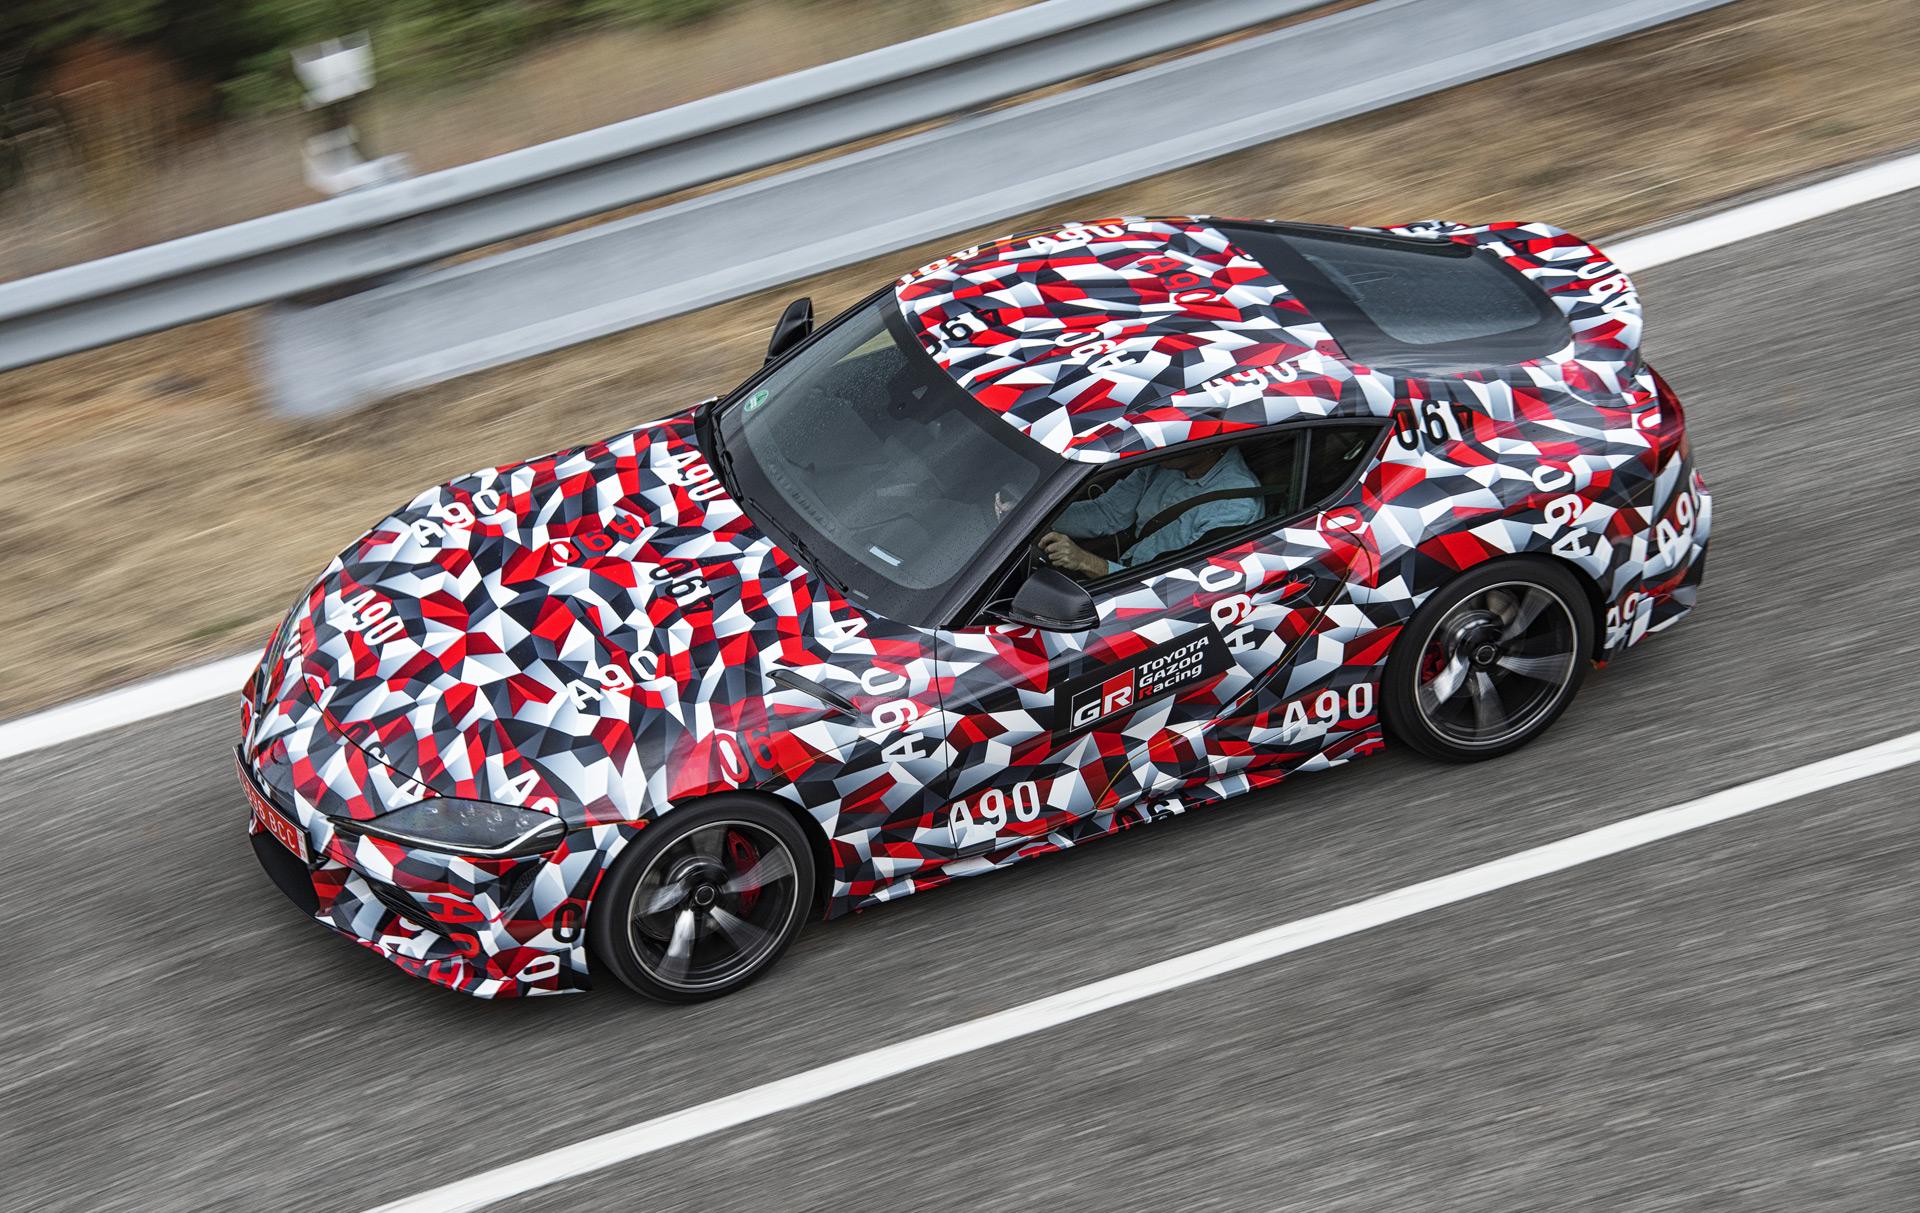 Toyota Supra To Be Built Alongside Bmw Z4 At Austrian Plant